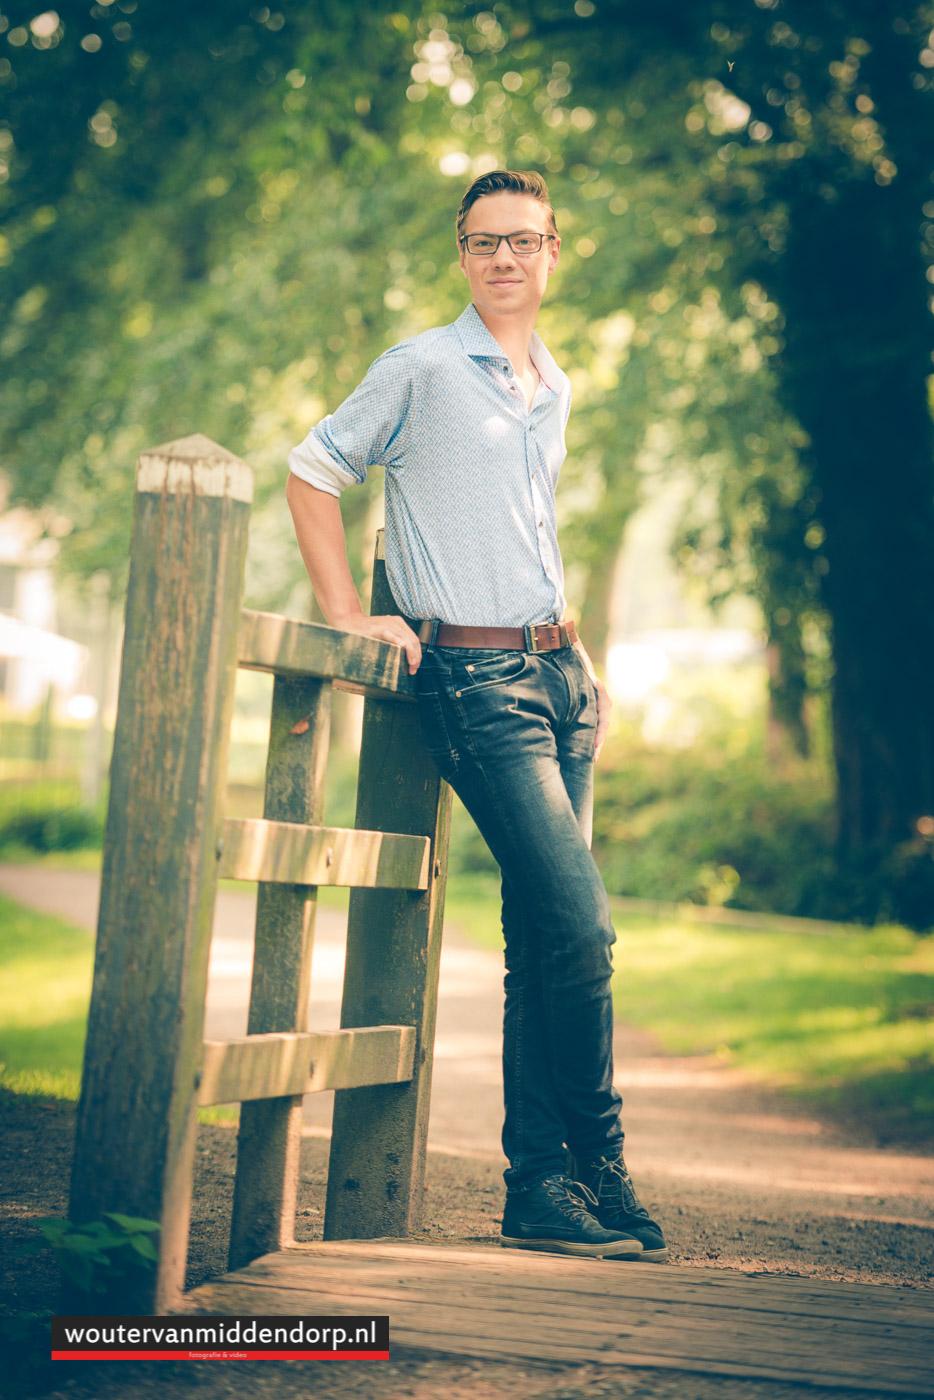 fotograaf Wouter van Middendorp Nunspeet-4